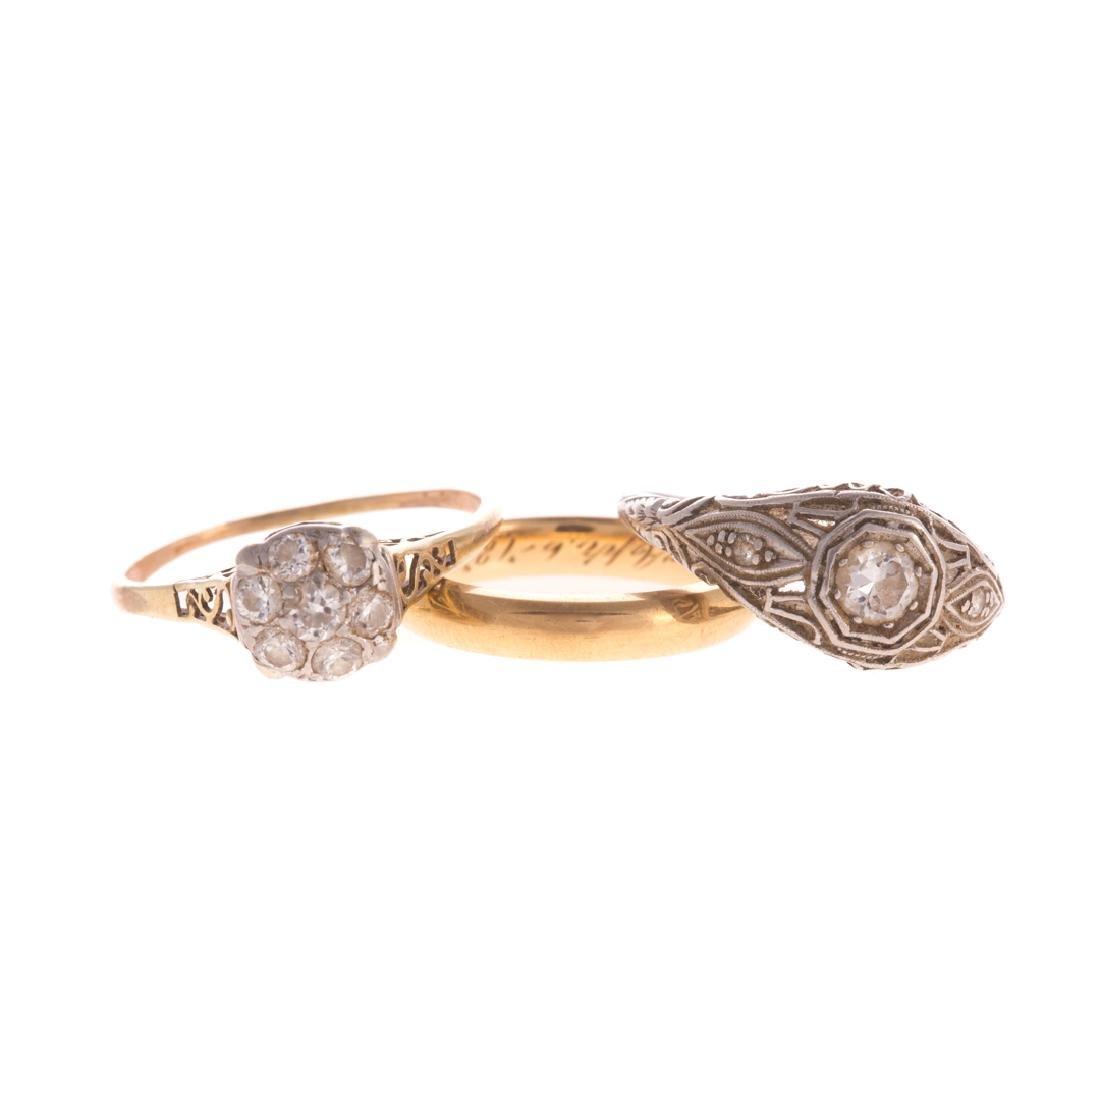 A Trio of Lady's Diamond Filigree Rings